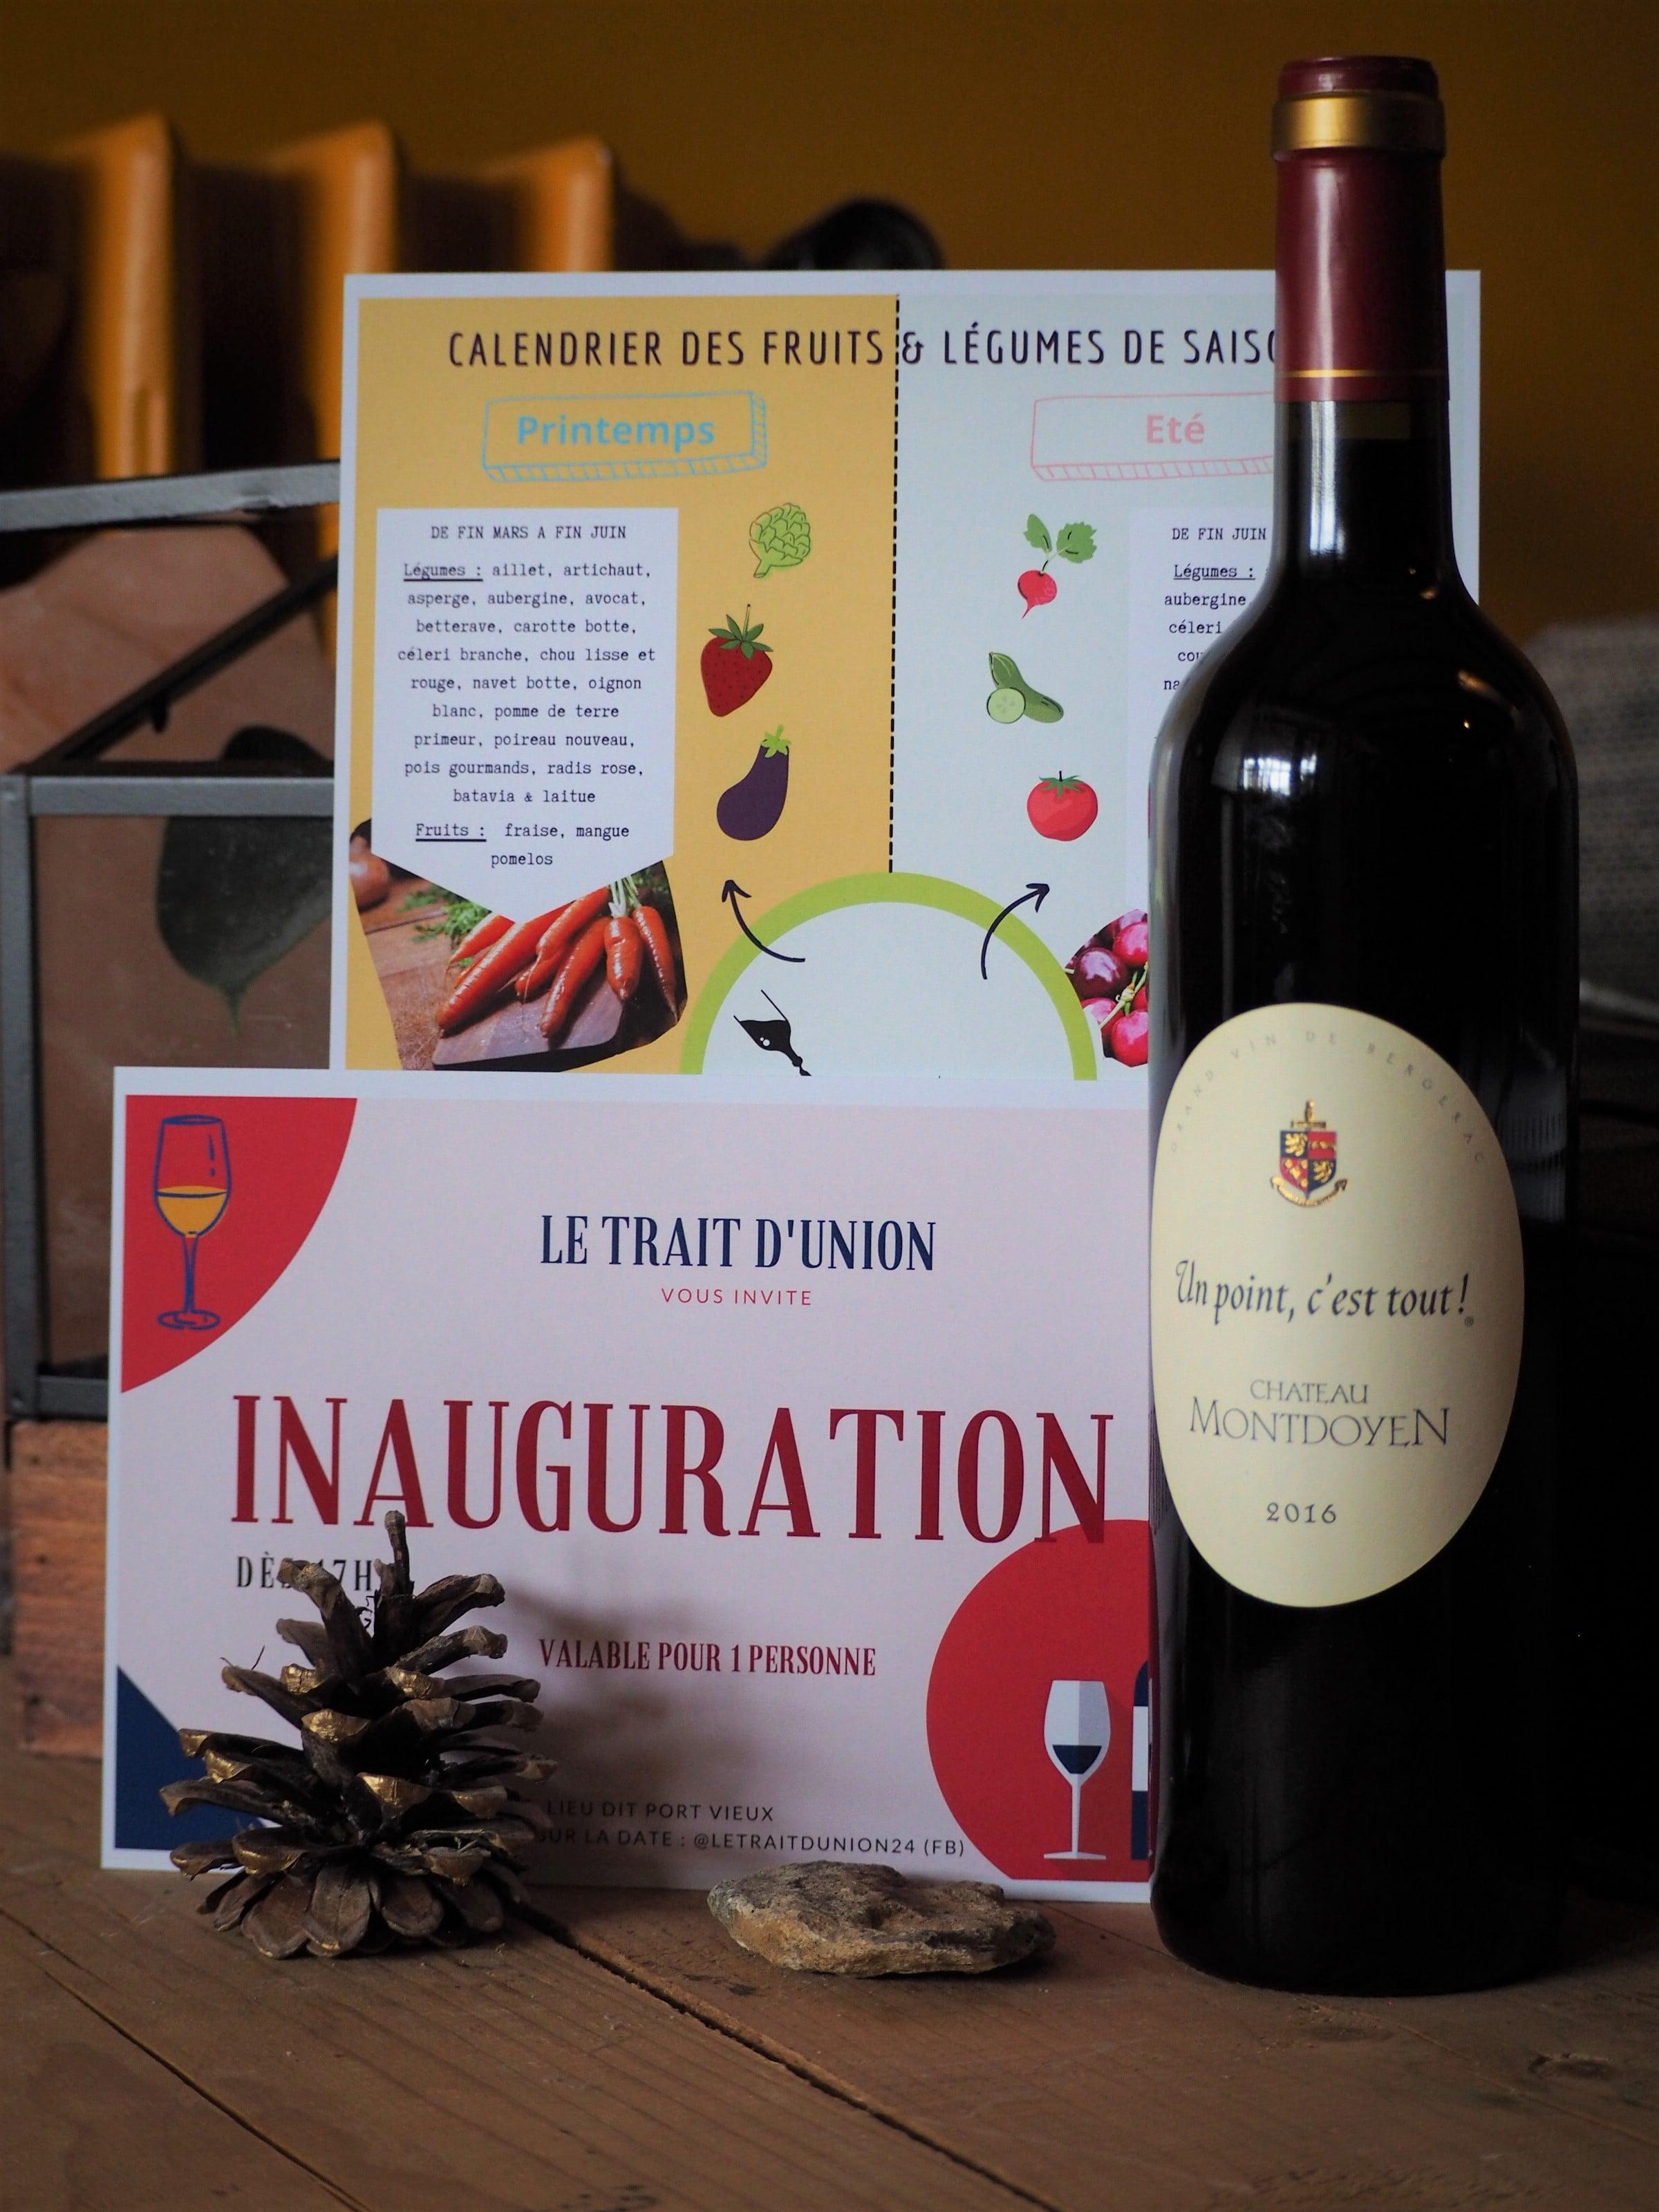 vin et invitation à l'inauguration